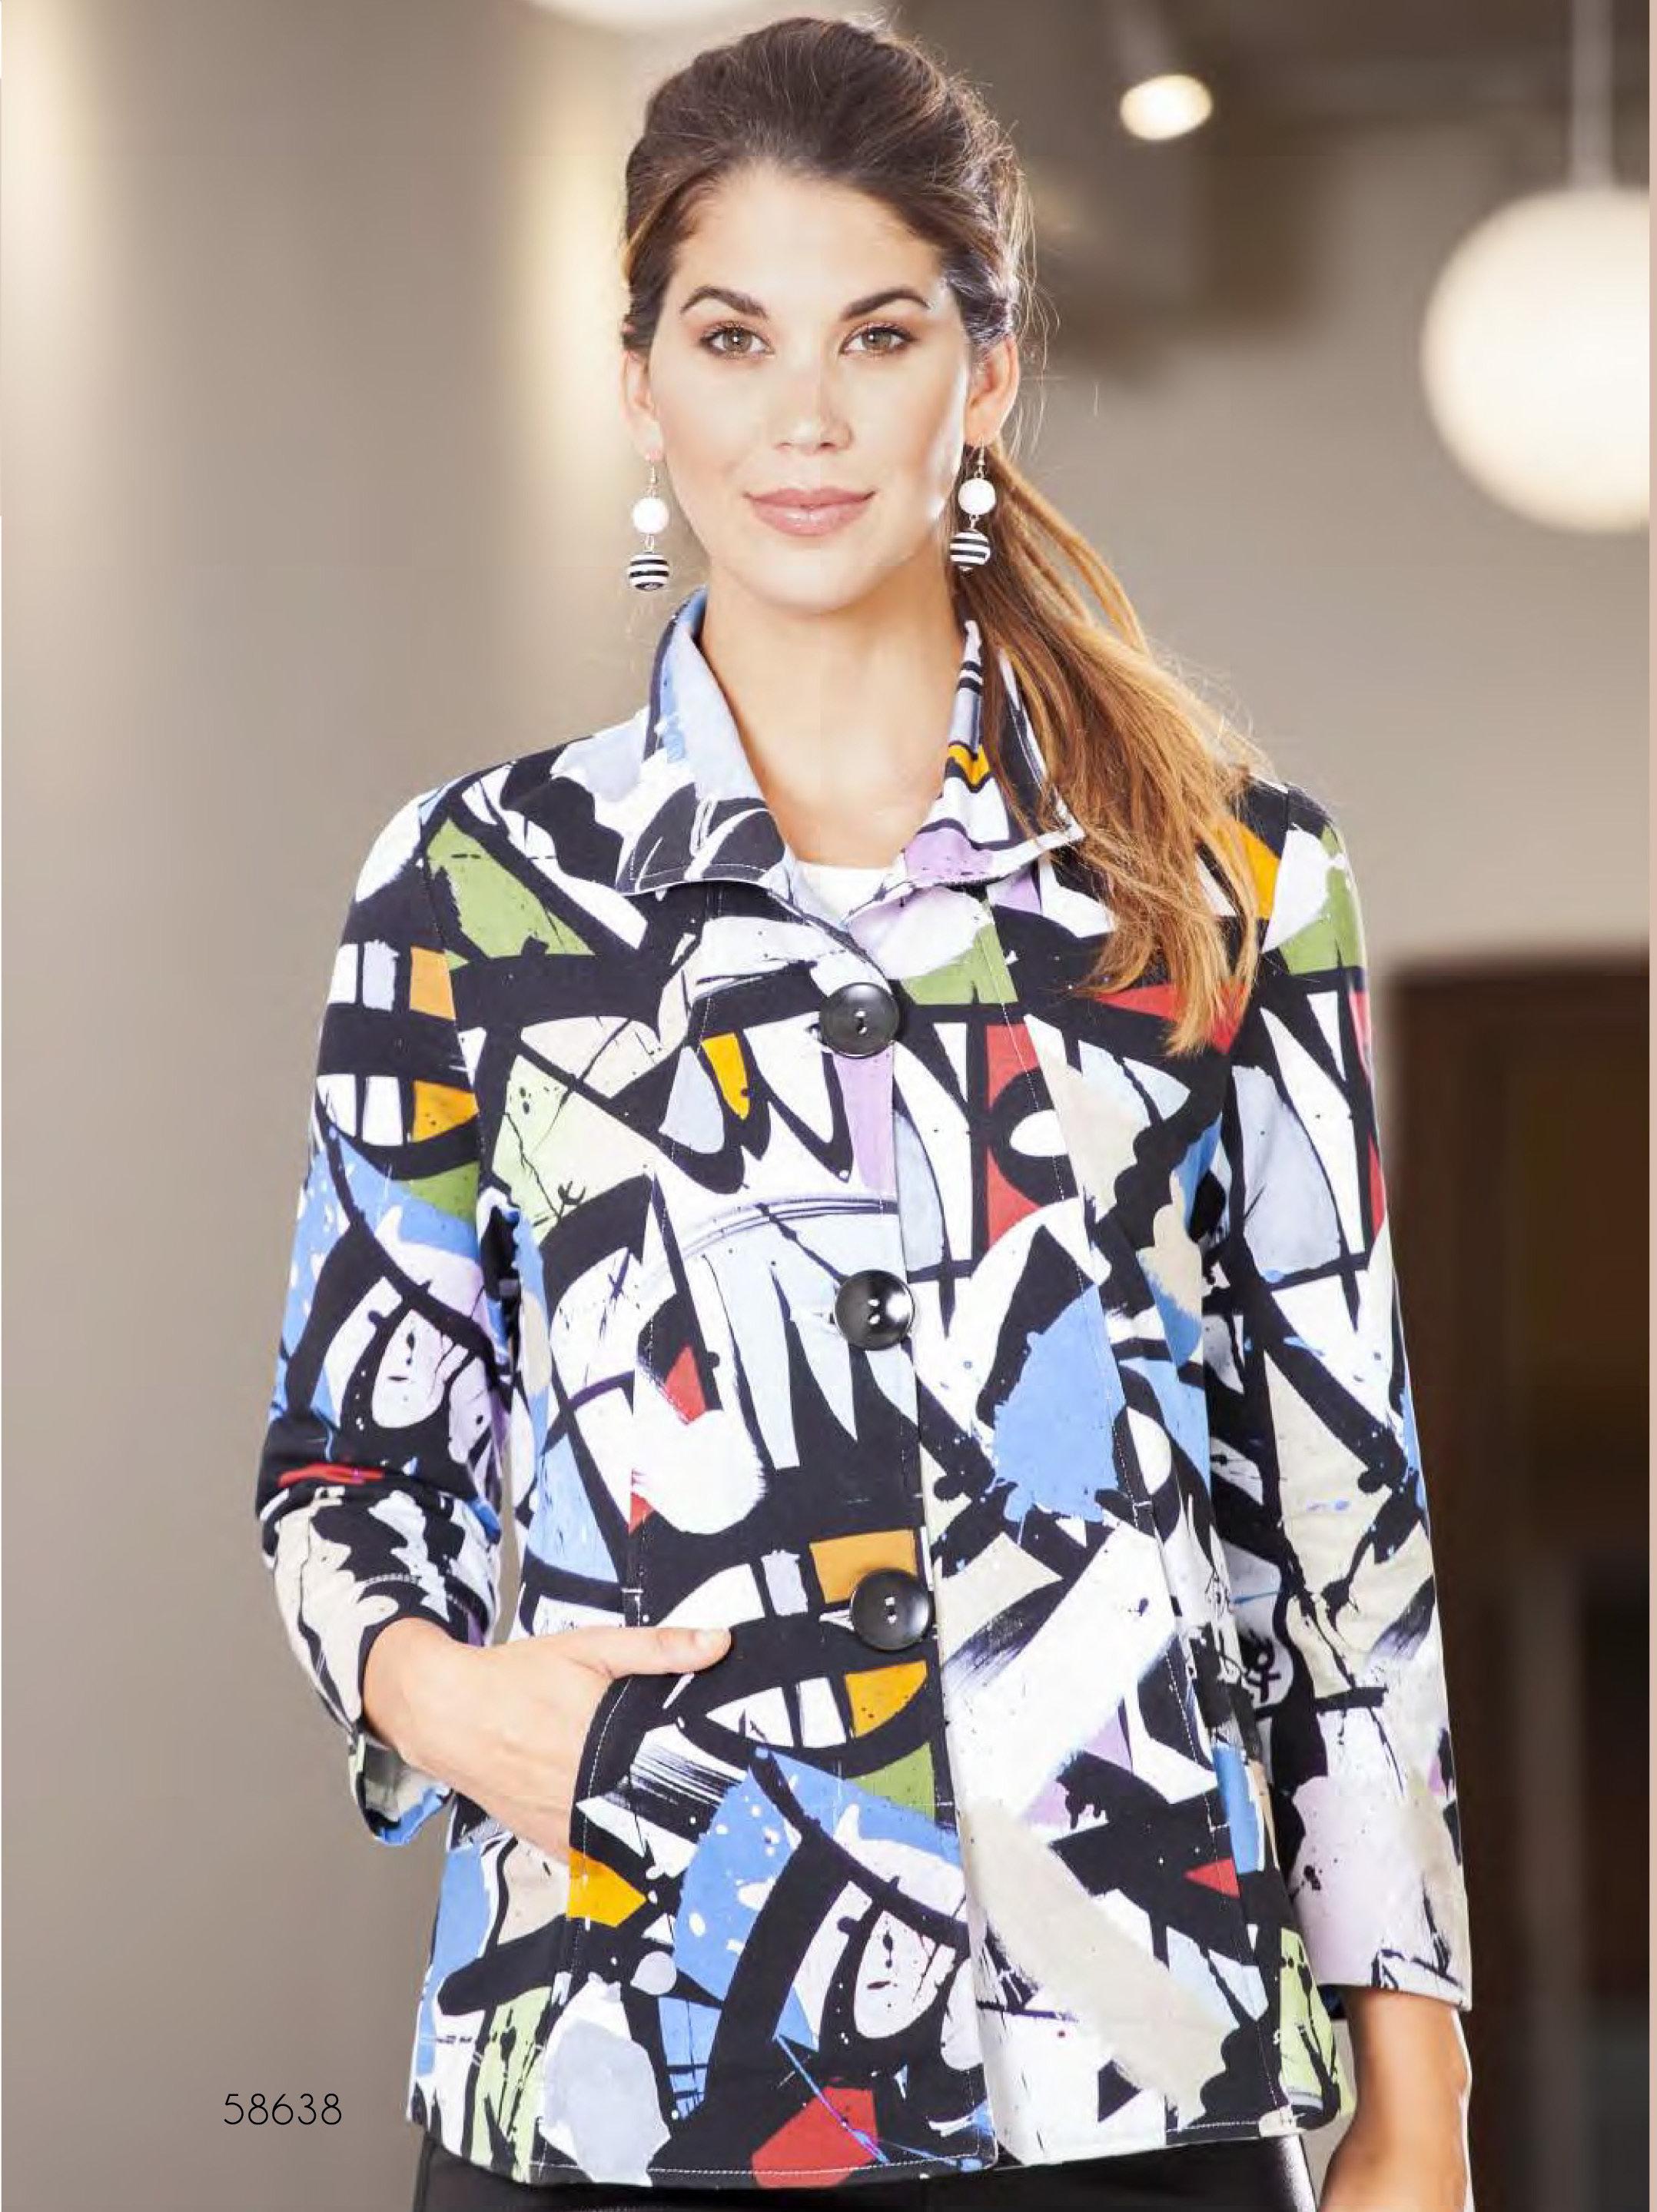 Simply Art Dolcezza: Gorgeous Graffiti Art Knit Cardigan Jacket (2 Left!) DOLCEZZA_SIMPLYART_58638_N1